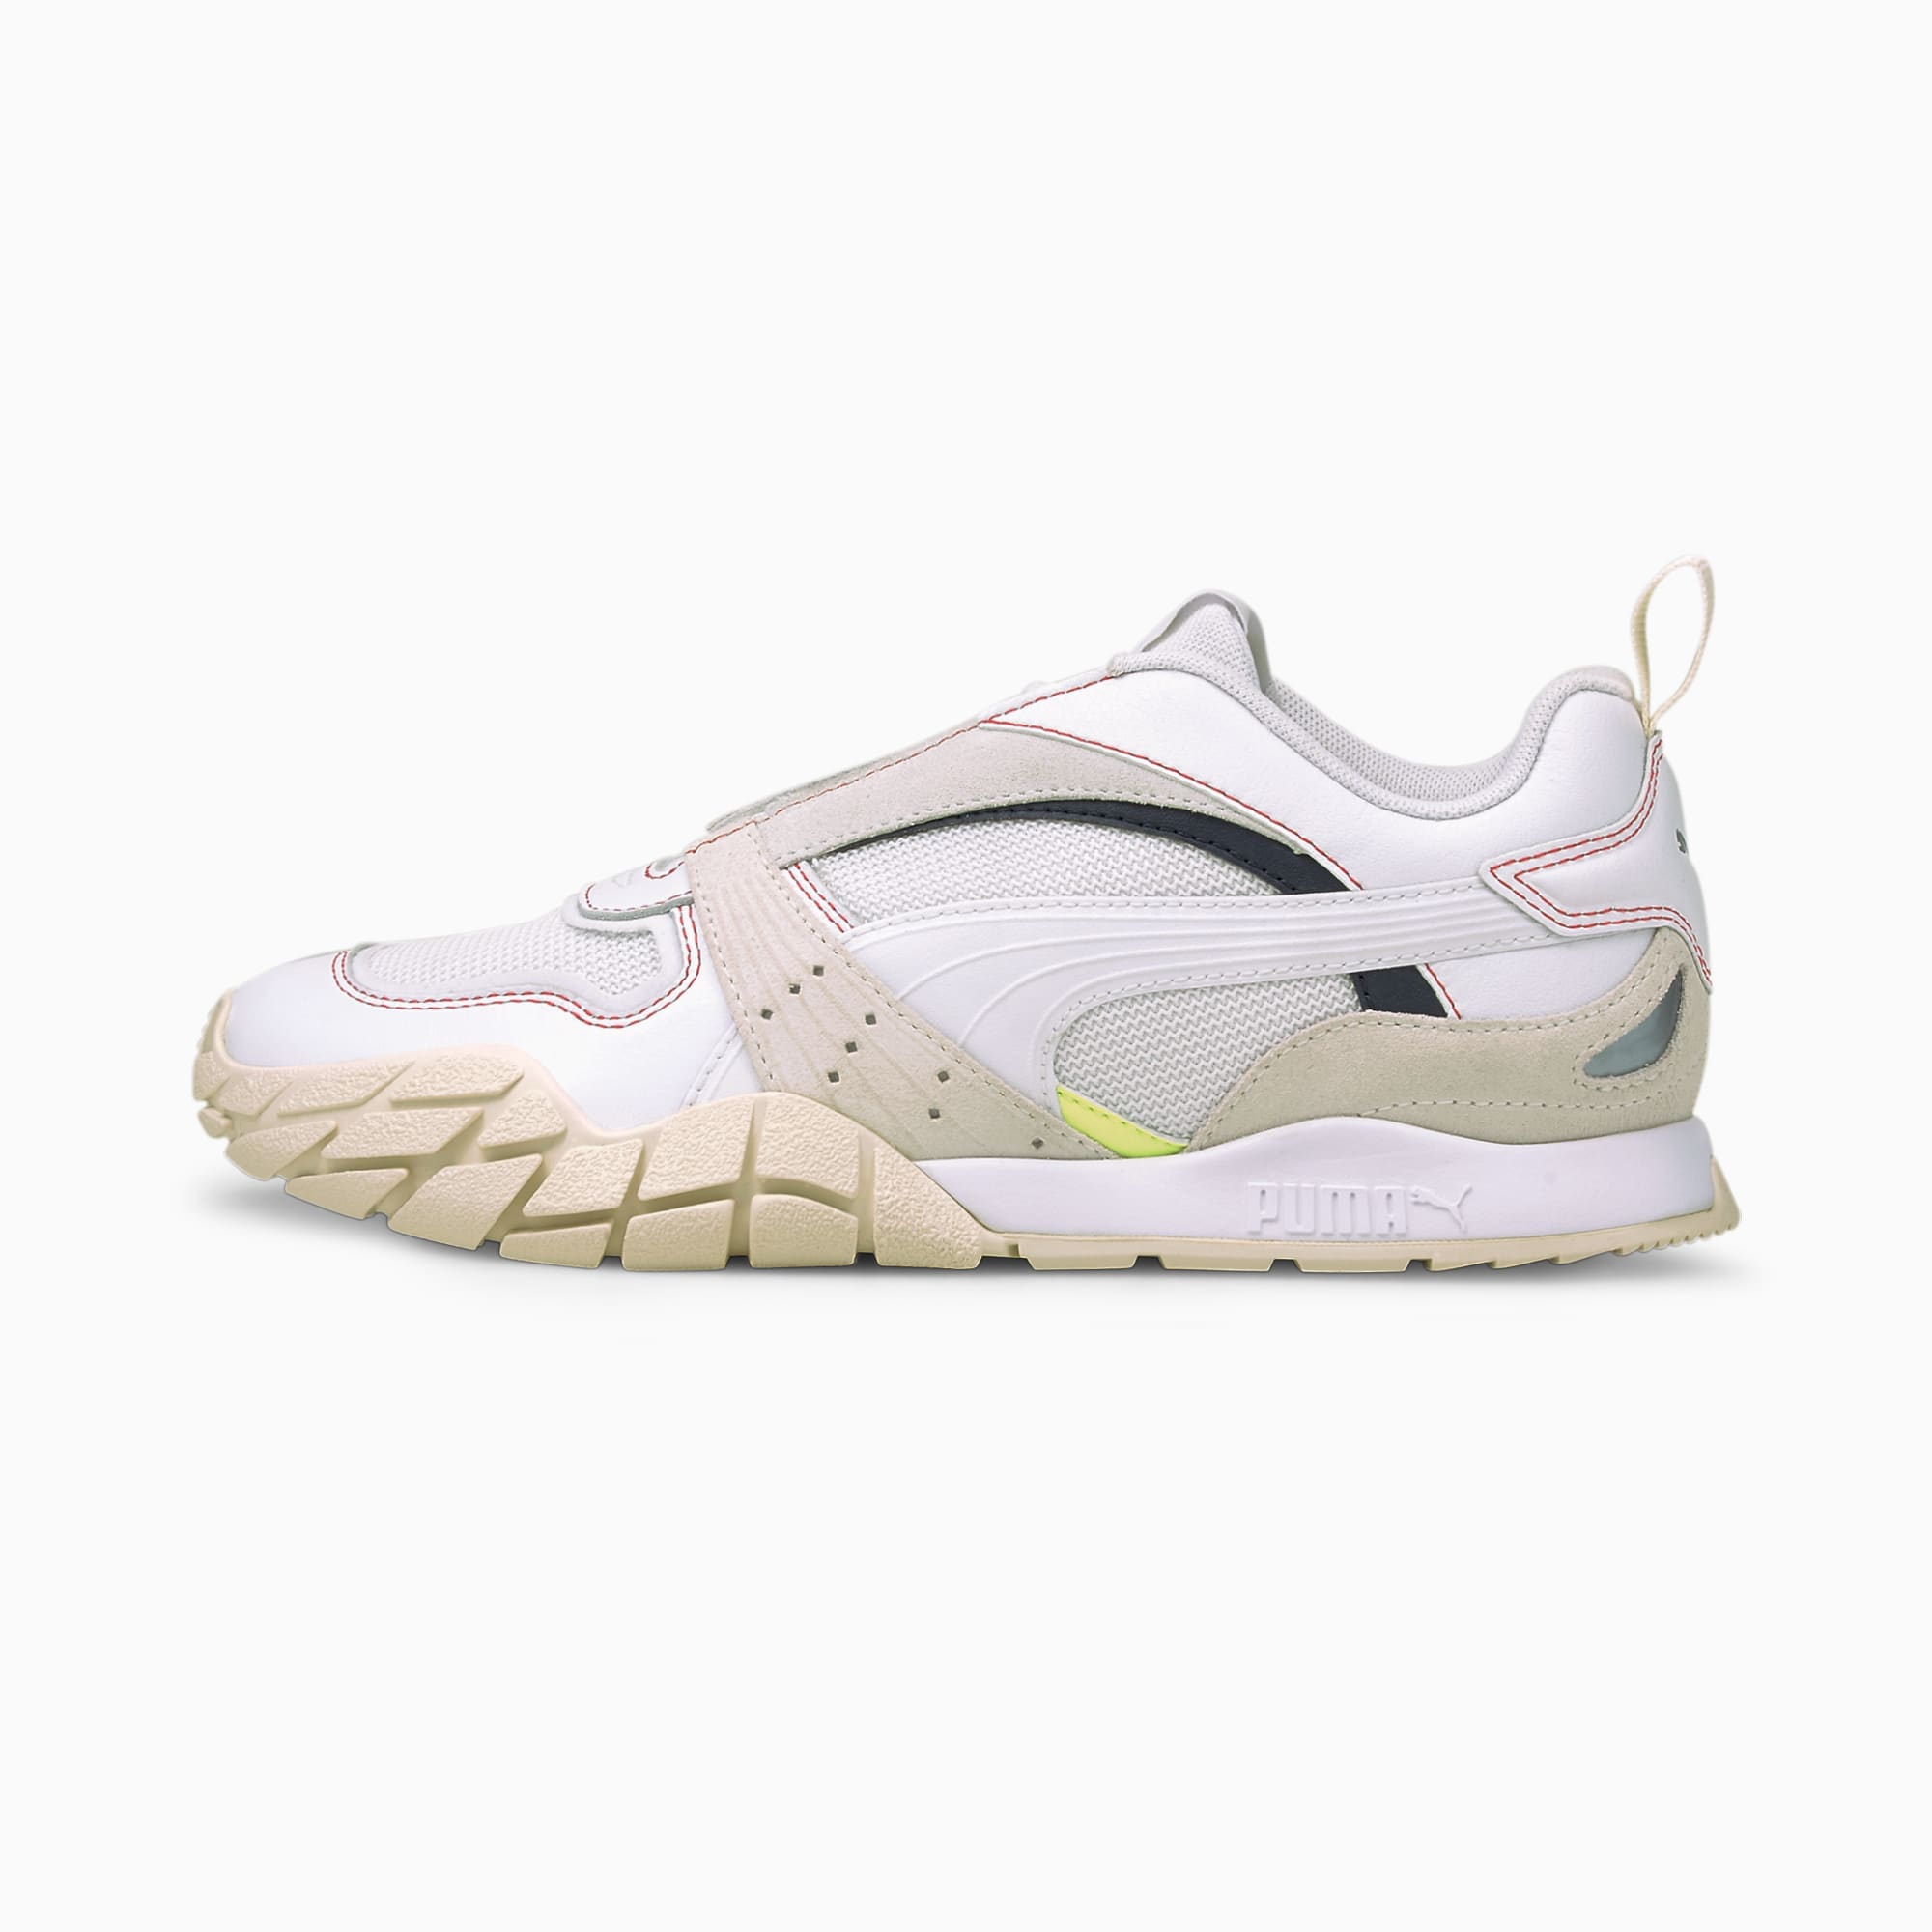 Kyron Fantasy sneakers dames, Wit/Zwart, Maat 41   PUMA